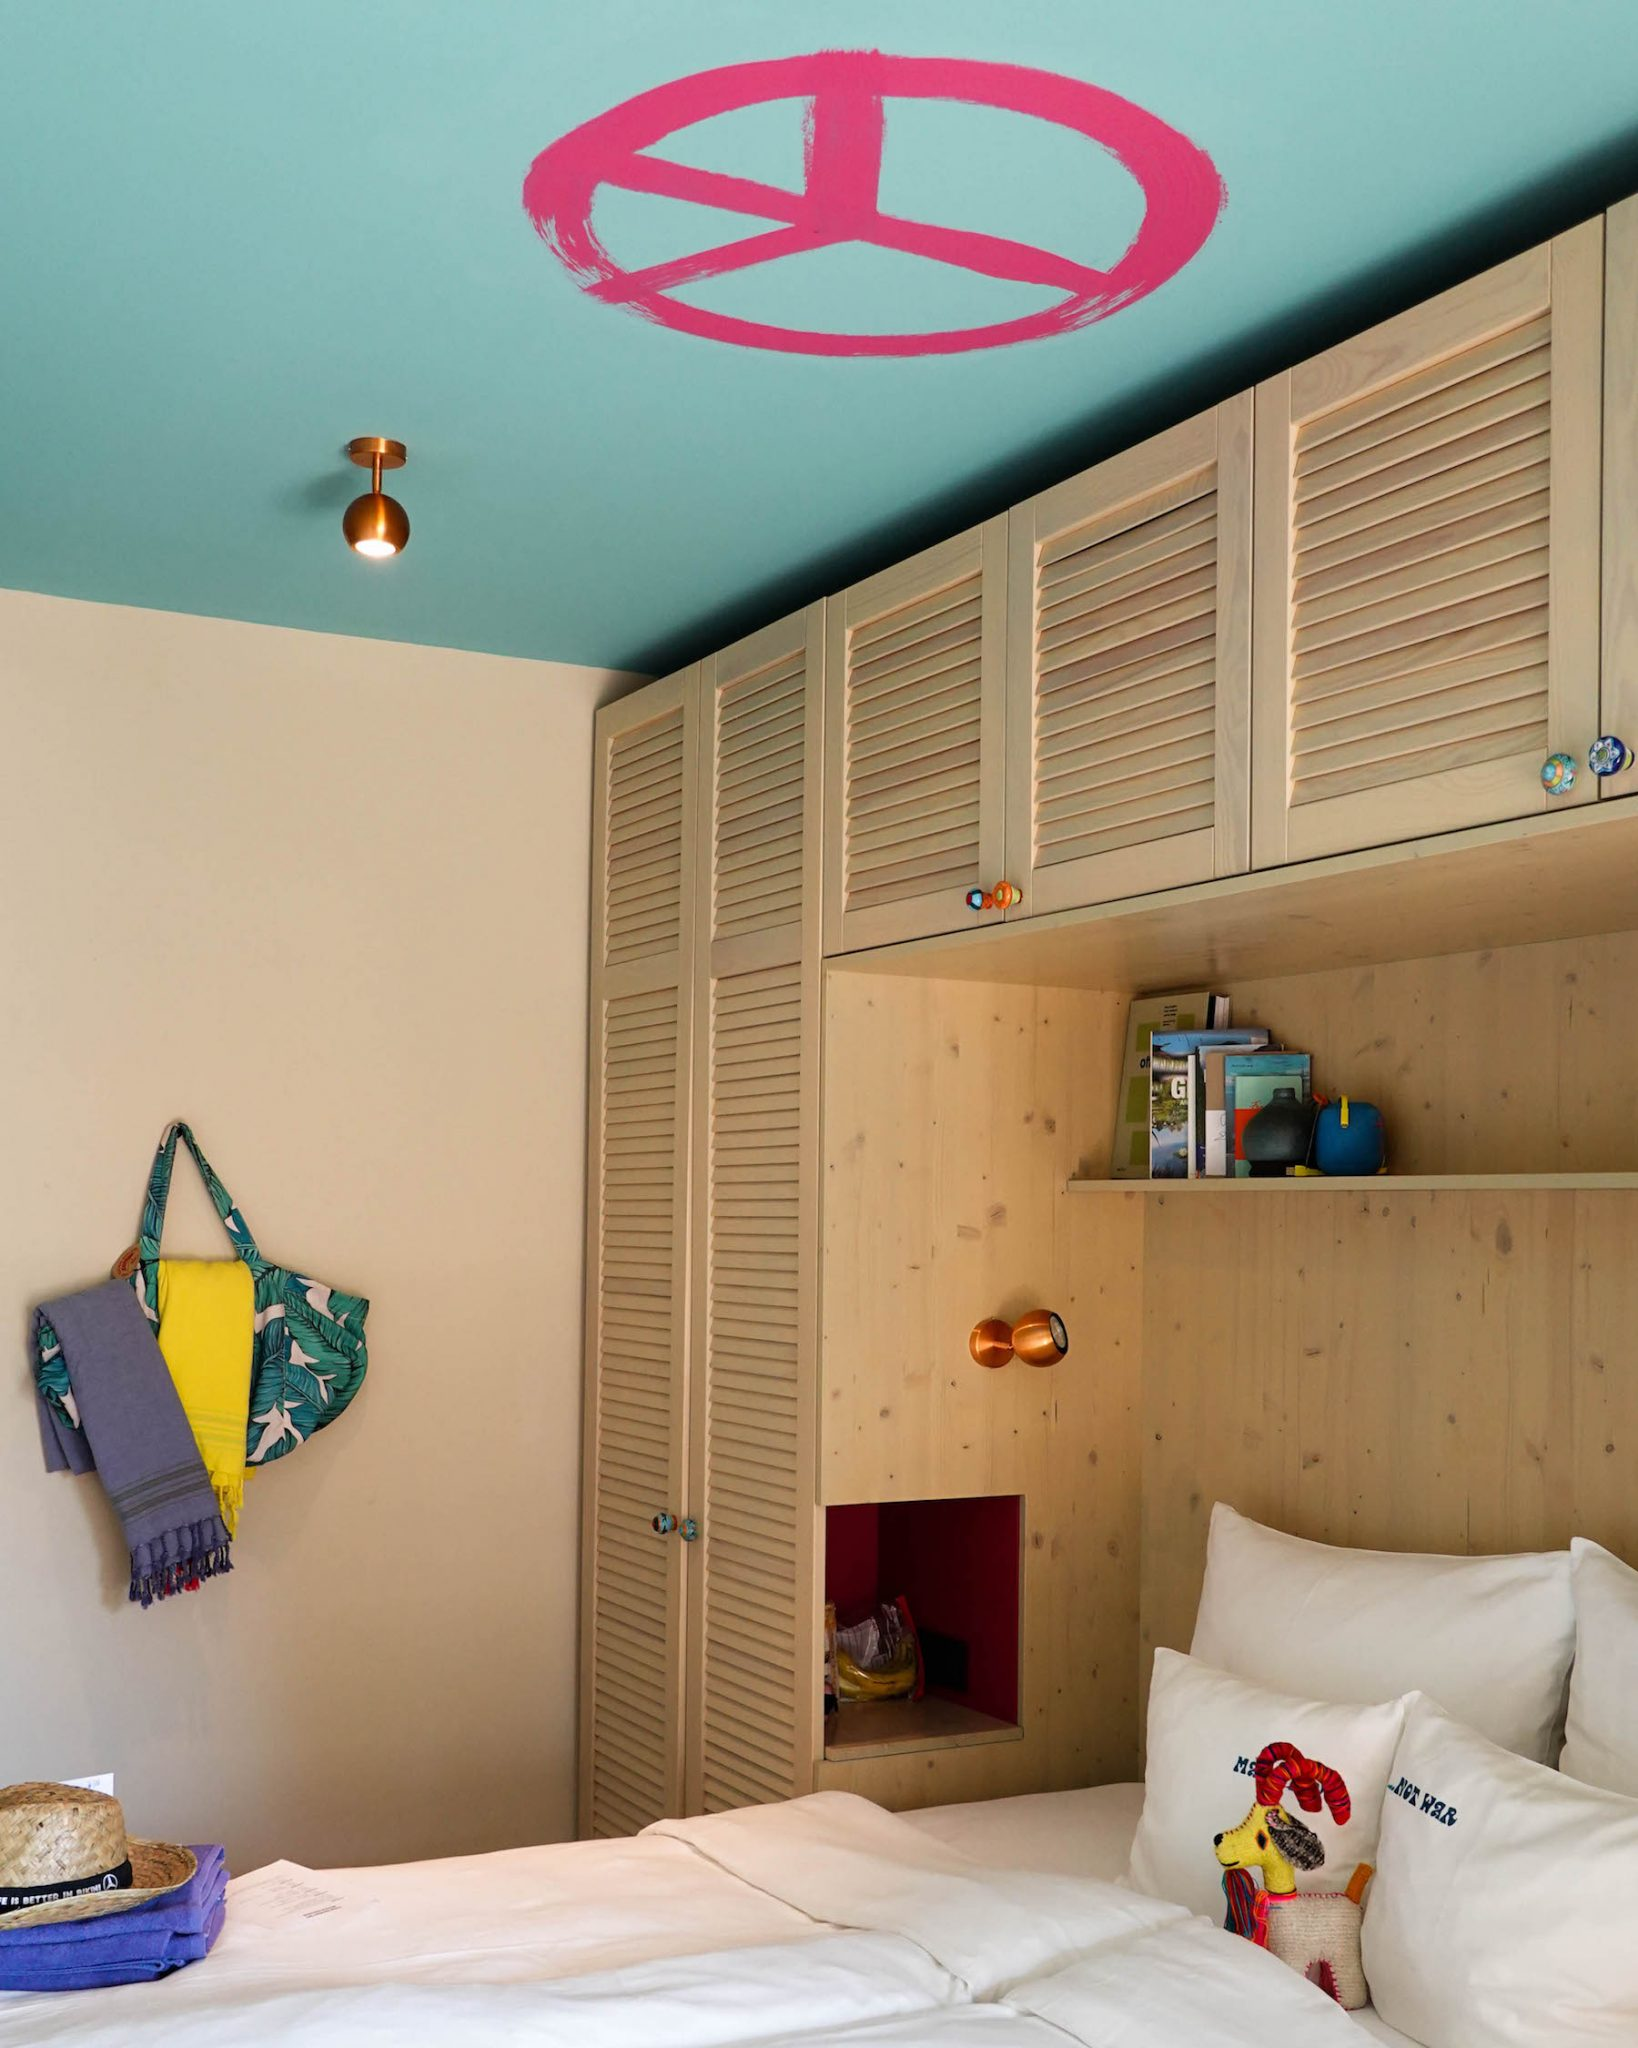 suelovesnyc_yoga_retreat_auf_mallorca_im_bikini_island_mountain_hotel_zimmer